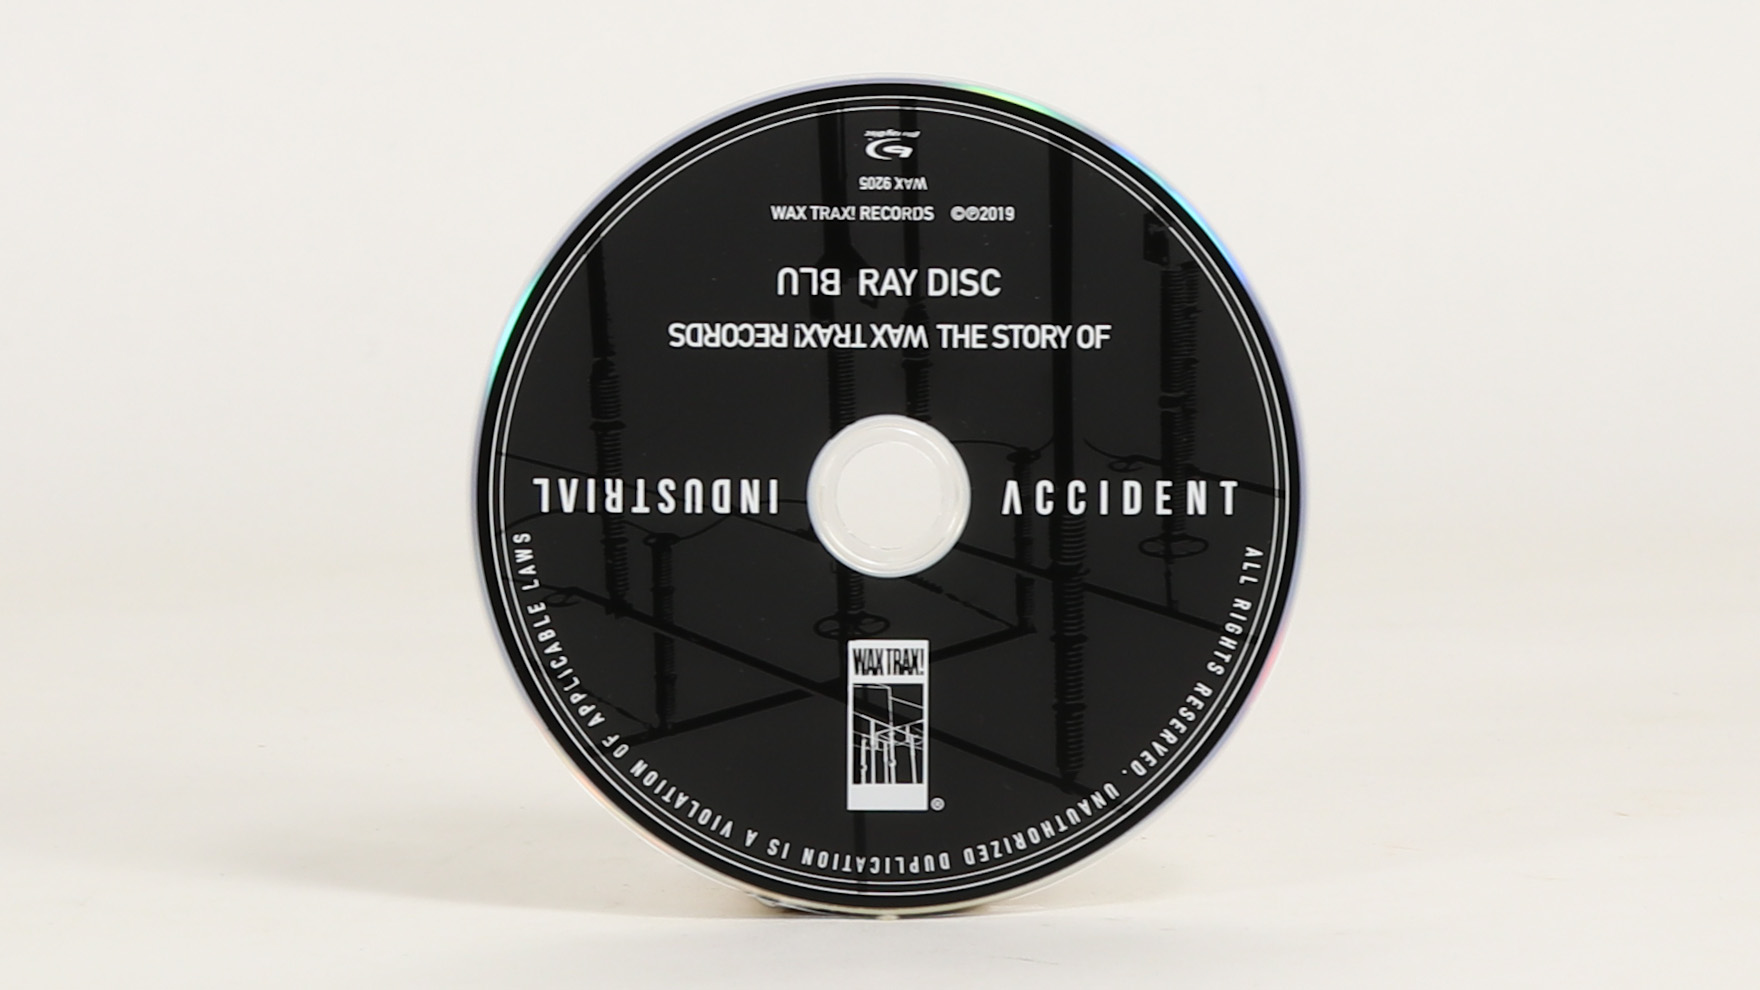 Wax Trax! – Industrial Accident [Blu-ray]